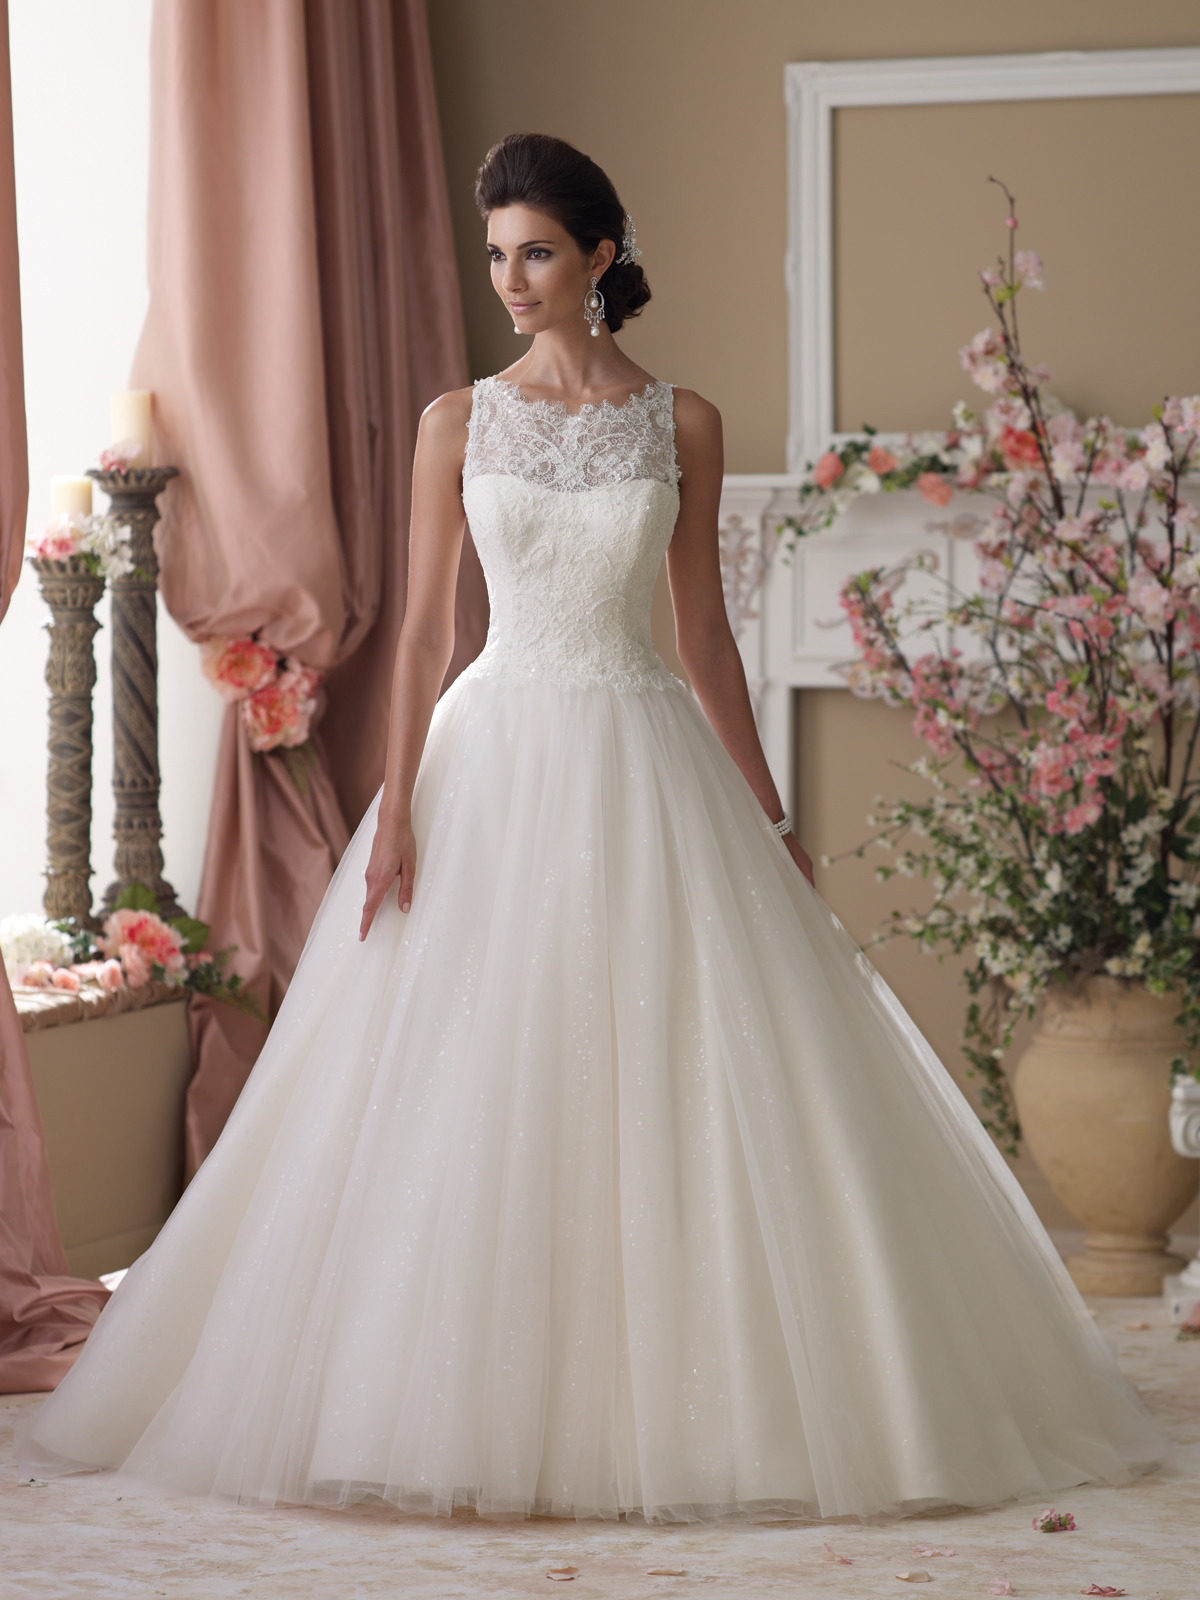 Vestido de Noiva Lovant - Hipnose Alta Costura e Spa para Noivas e Noivos - Campinas - SP Vestido de Noiva, Vestidos de Noiva Princesa, Hipnose Alta Costura, Vestido de Noiva Lovant